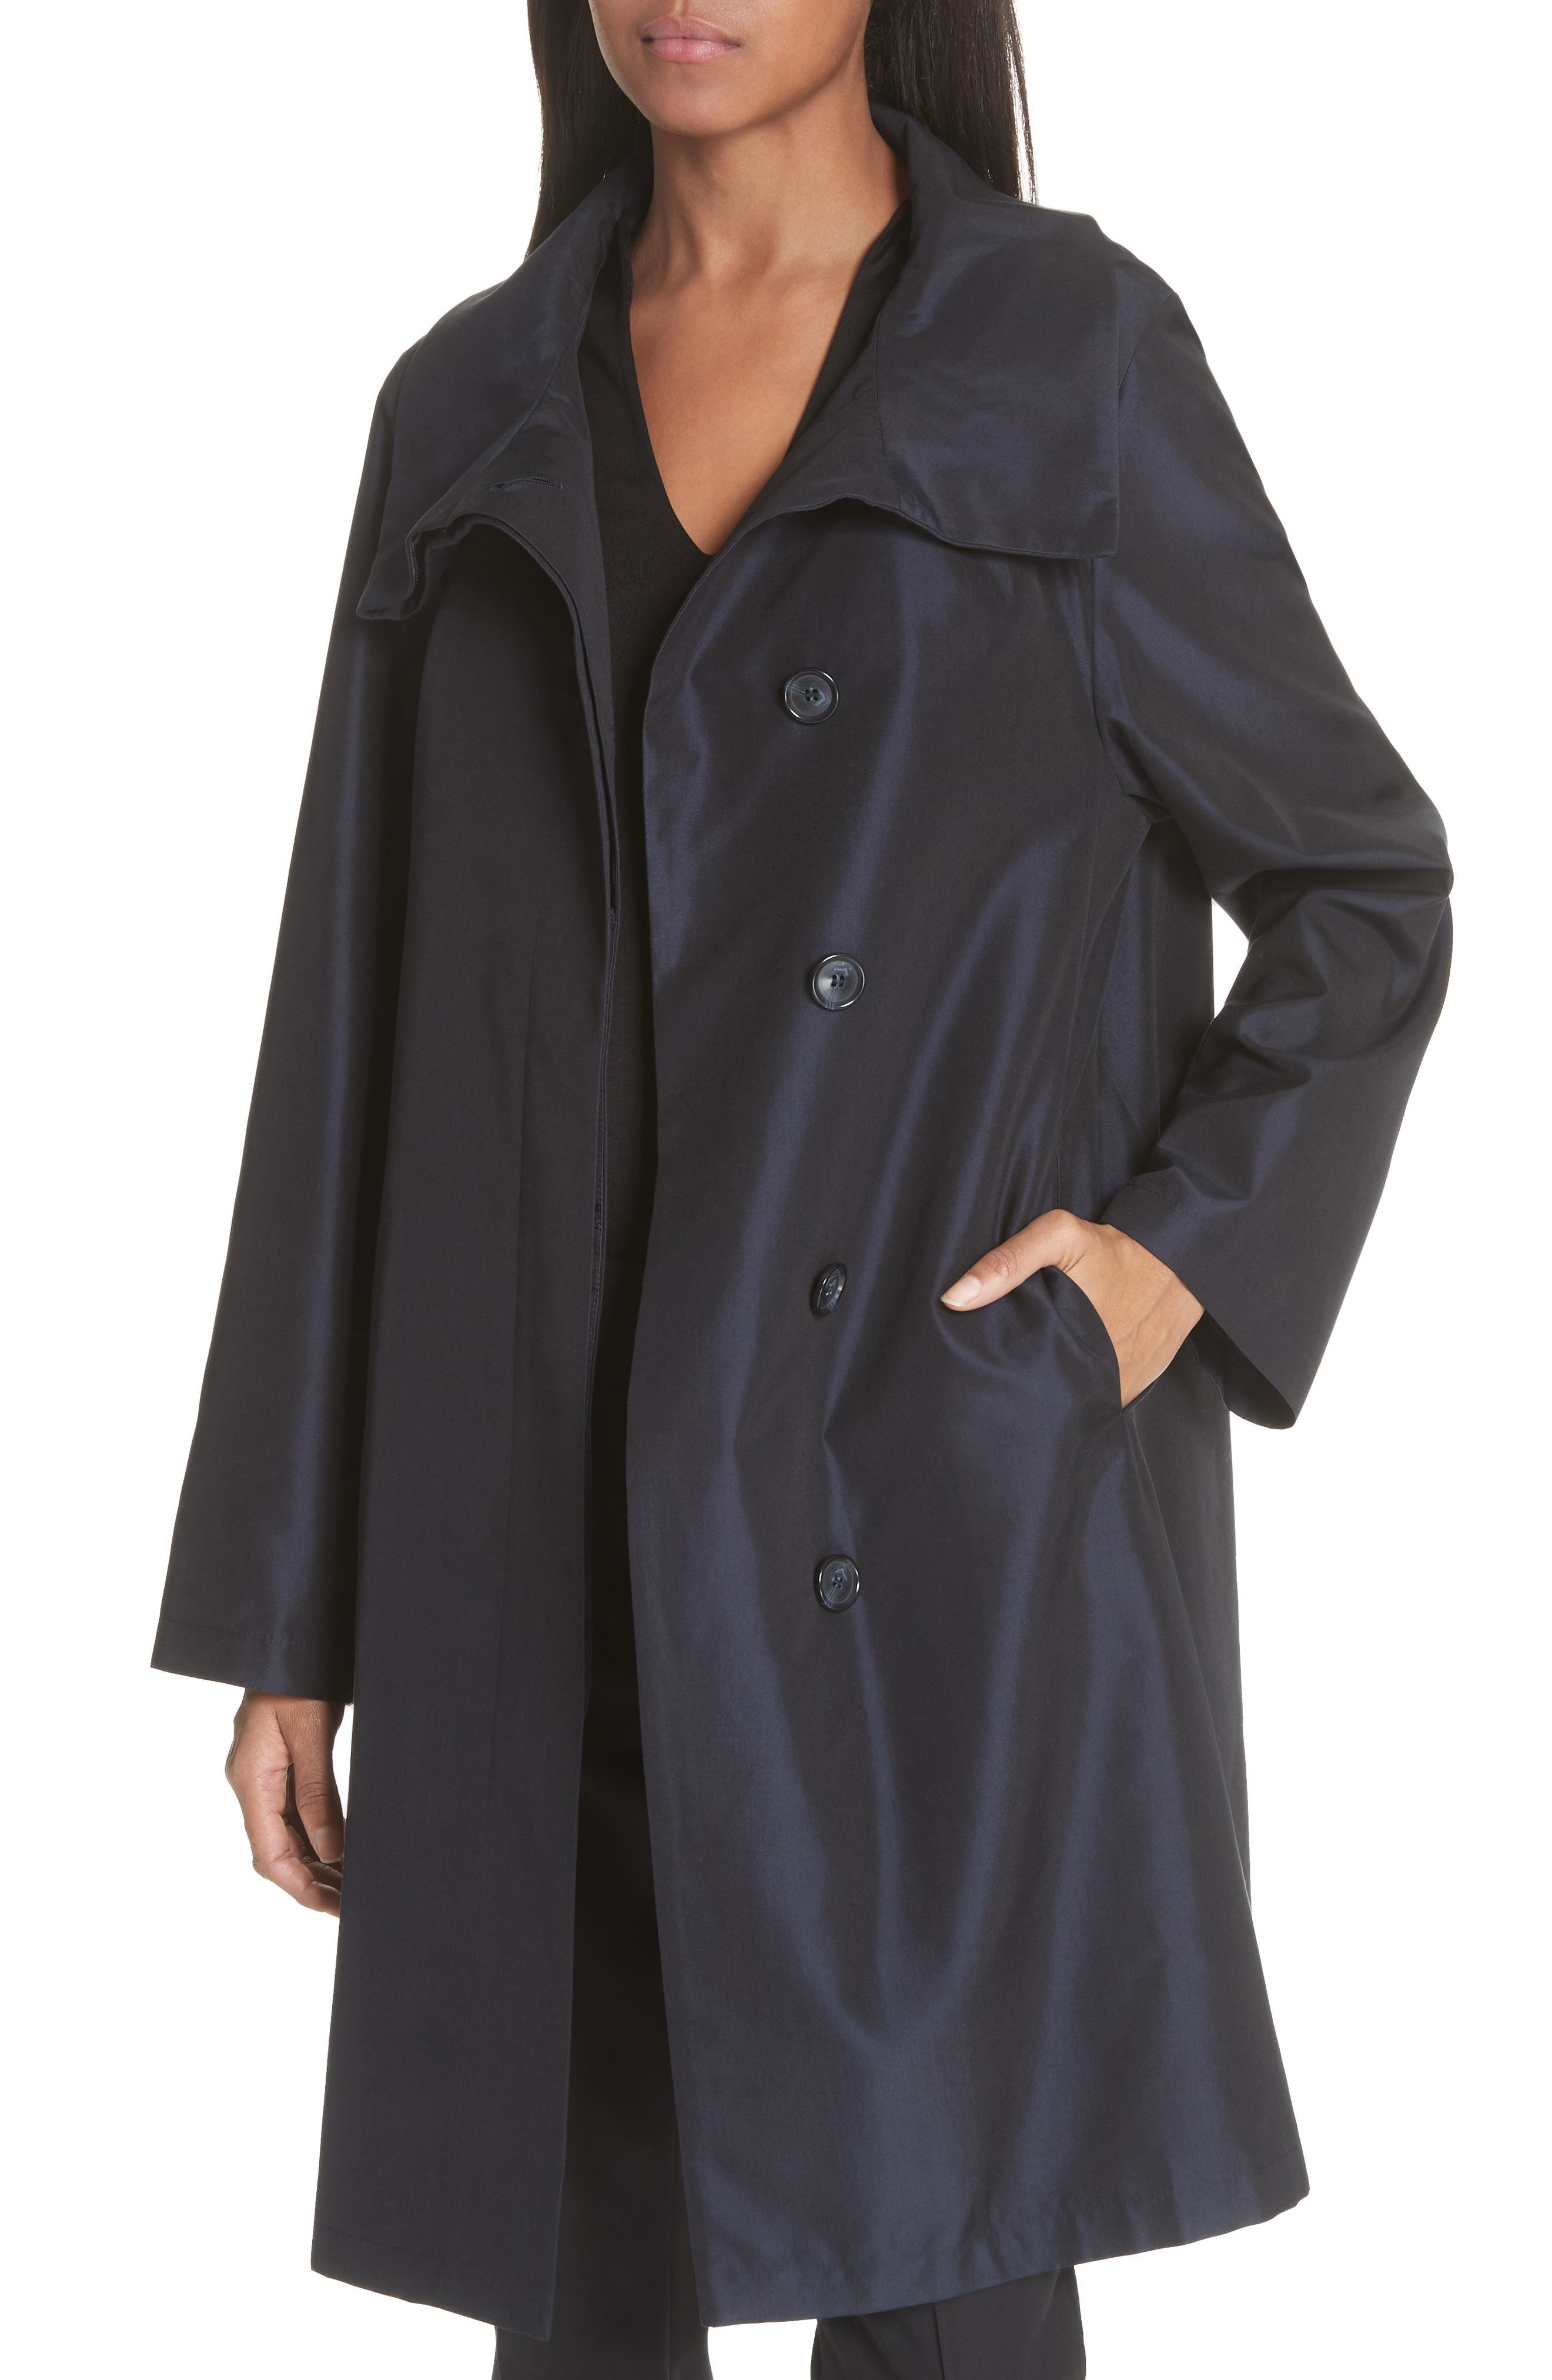 3-in-1 Technical Coat,                             Alternate thumbnail 3, color,                             BLACK